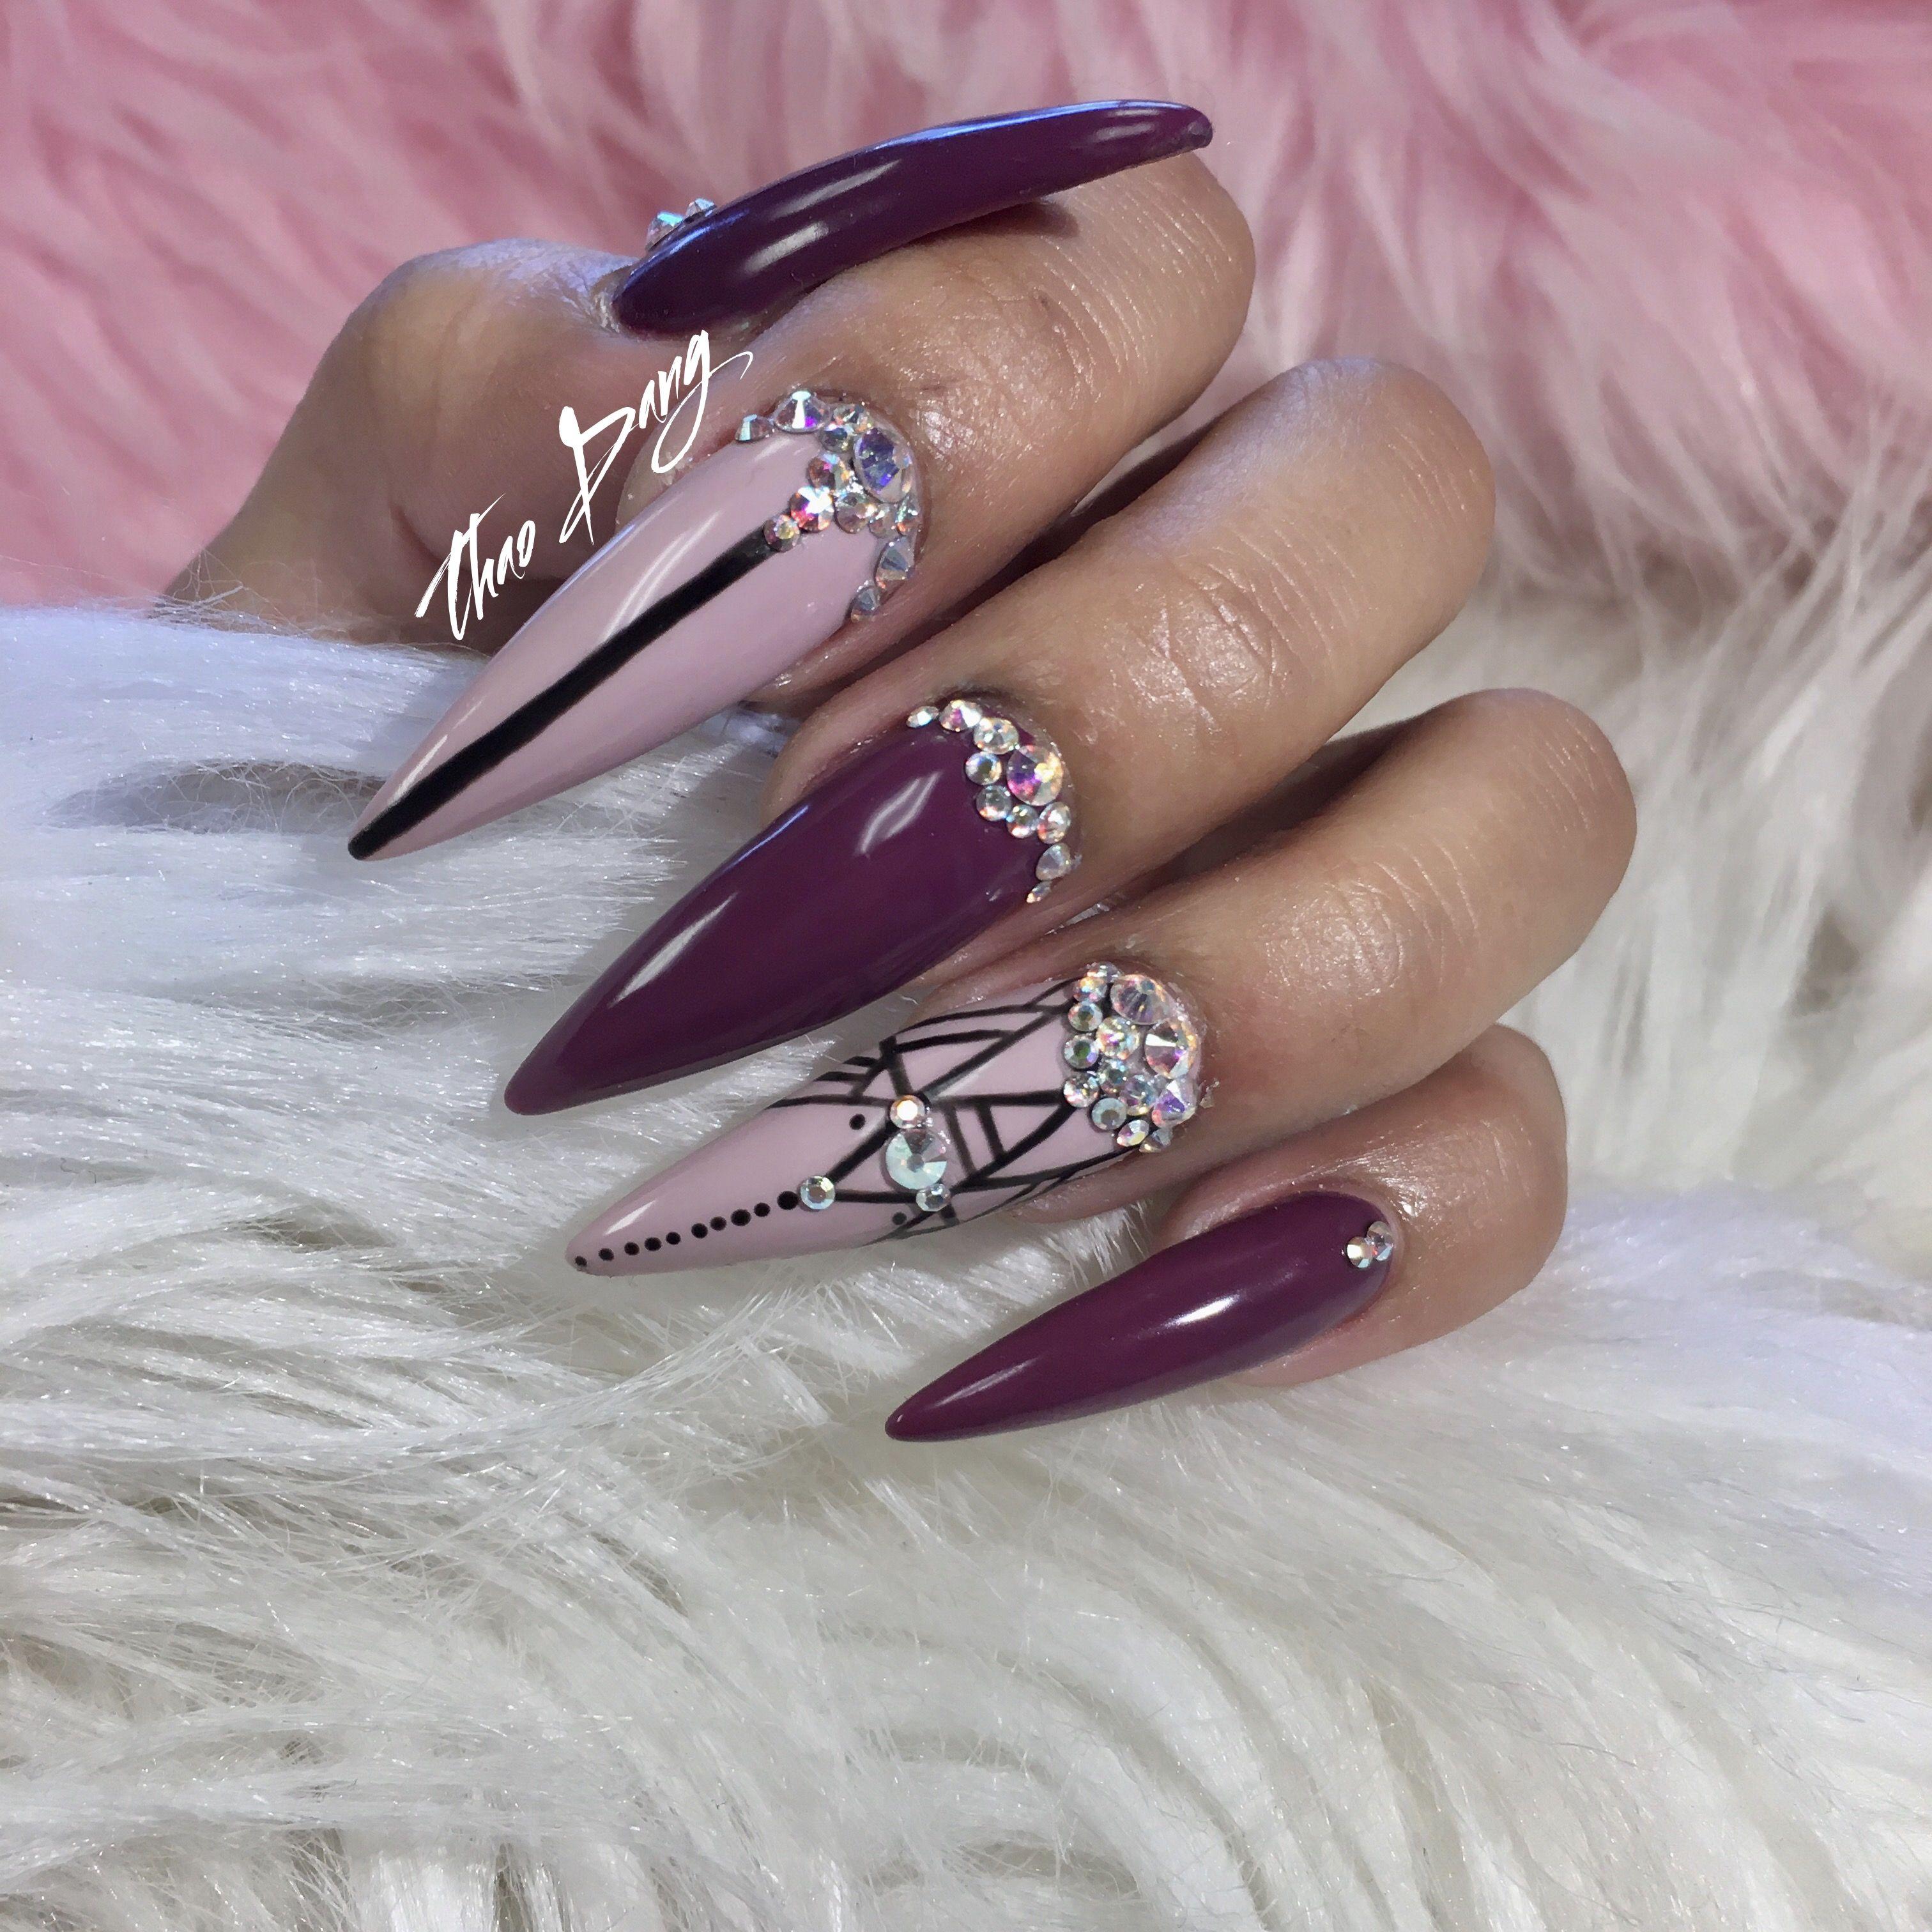 Nail Art with Swarovski crystals